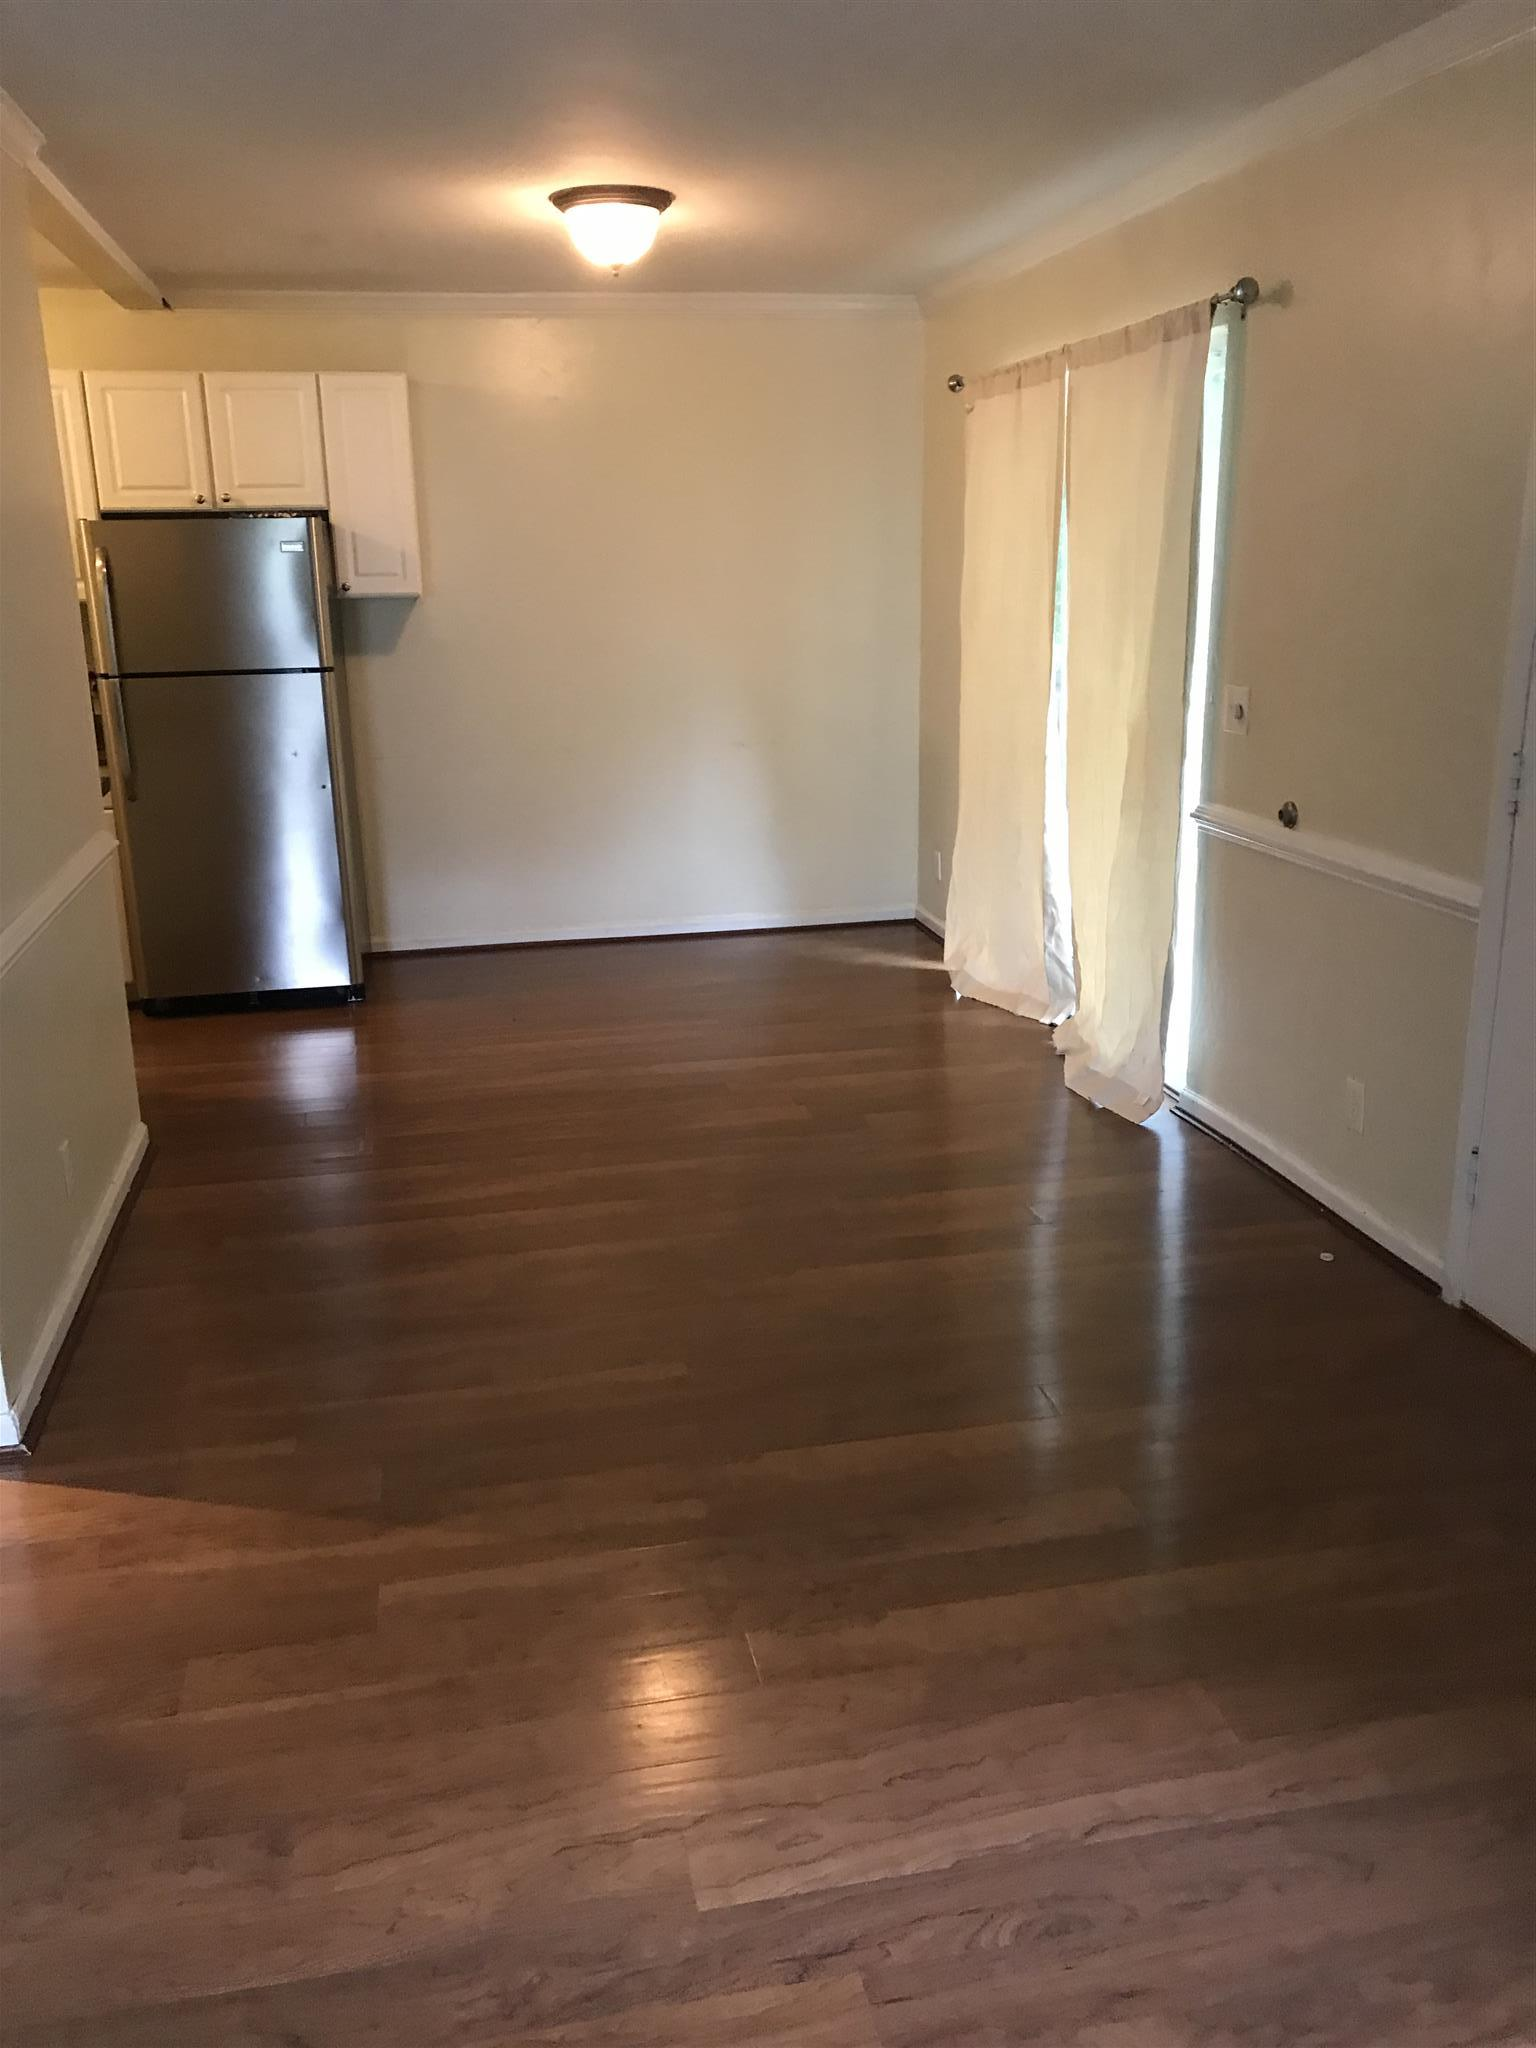 550 Harding Pl Apt B107, Nashville, TN 37211 - Nashville, TN real estate listing